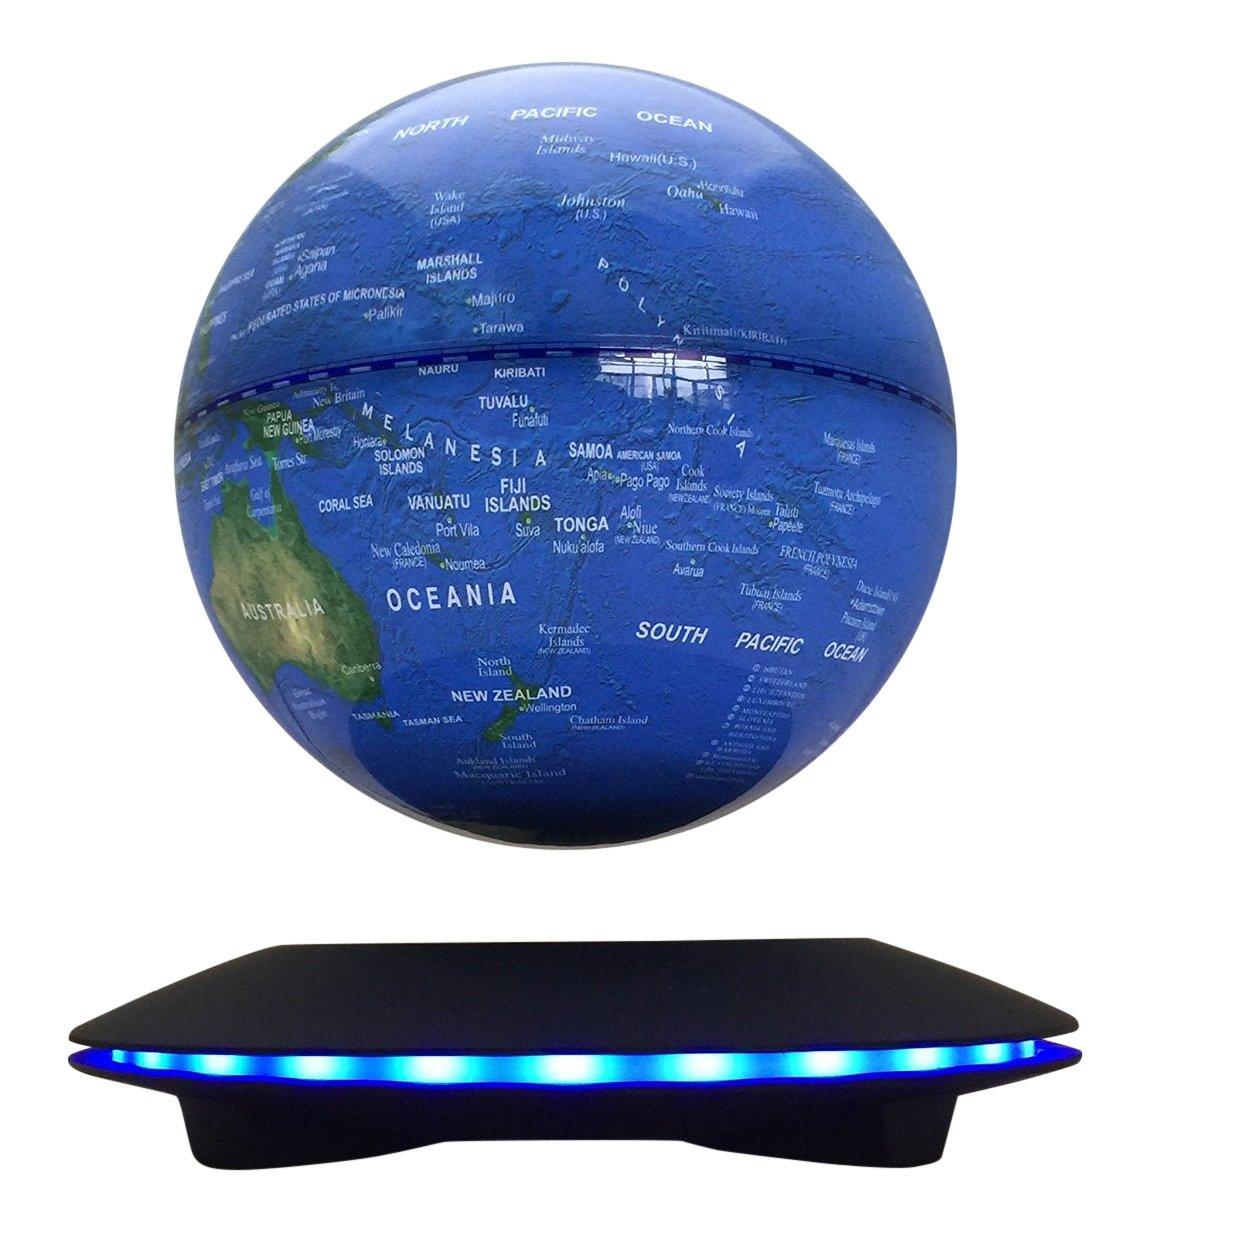 woodlev Maglev Magnetic Levitation Levitron Floating Rotating Wireless Transmission Touch Control Three Gears 6'' Blue Globe Black Platform LED Adjustment Home Decor Upgraded Version